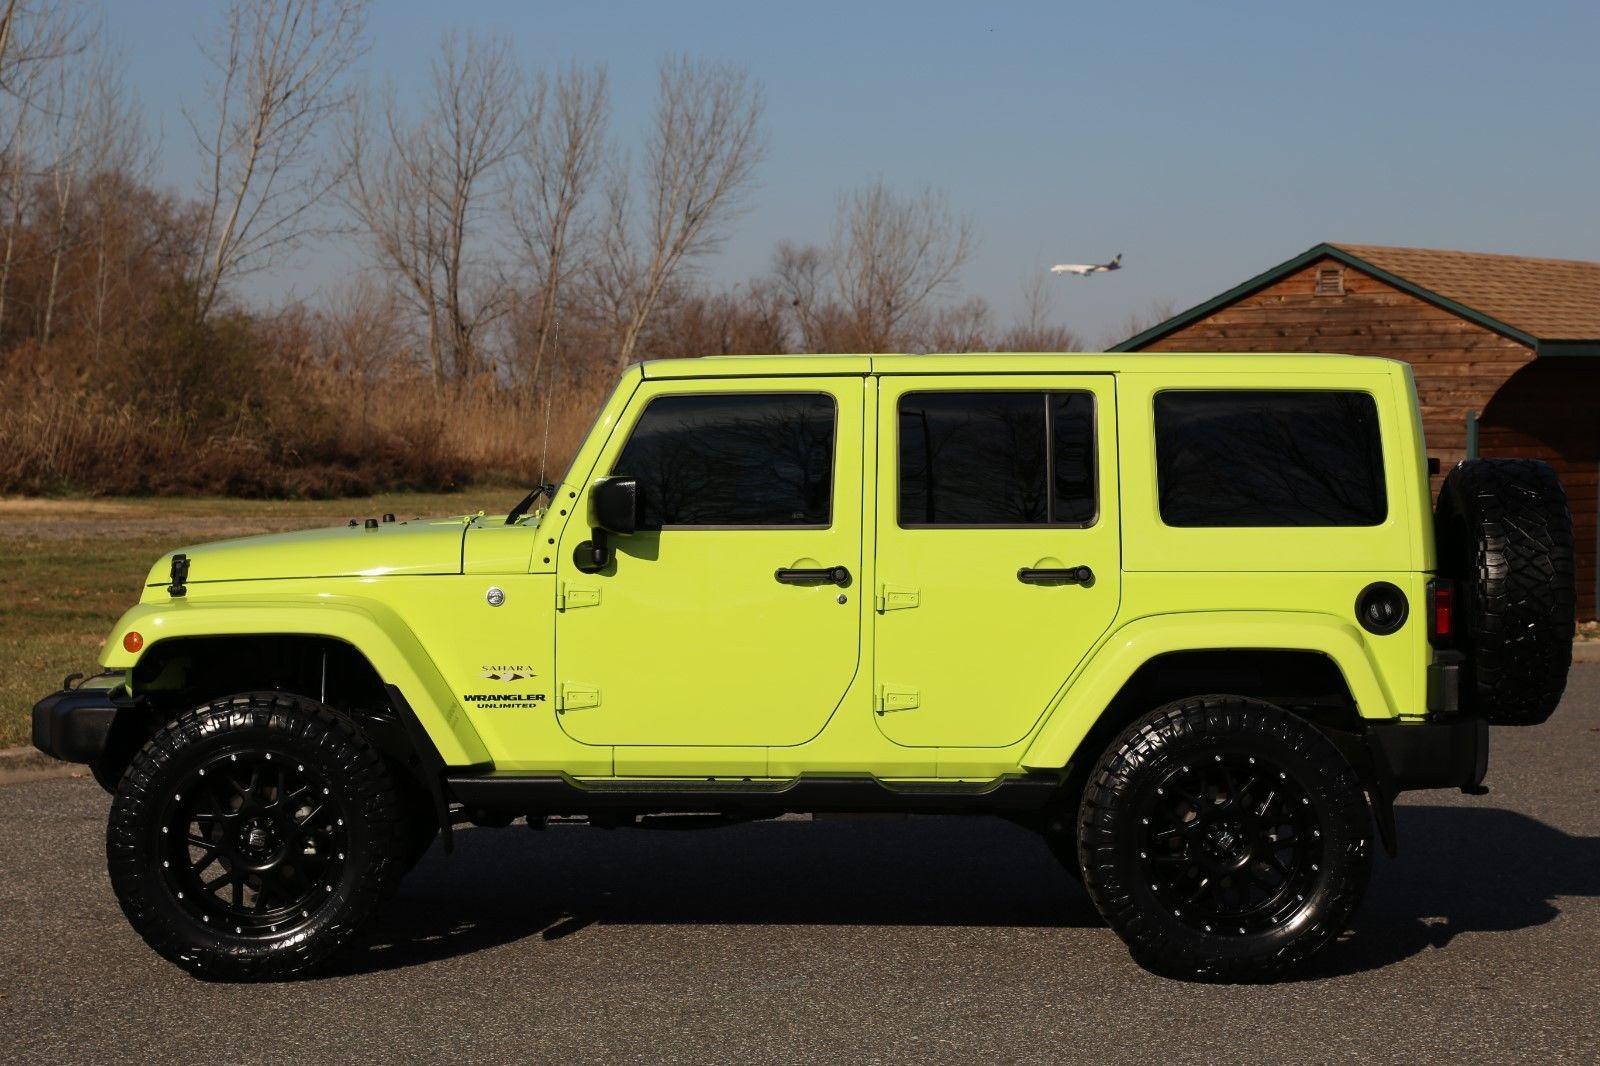 Ebay 2016 Jeep Wrangler Unlimited Sahara 2016 Jeep Wrangler Unlimited Hyper Green 7k Miles 1 O Jeep Wrangler Unlimited Jeep Wrangler Wrangler Unlimited Sahara